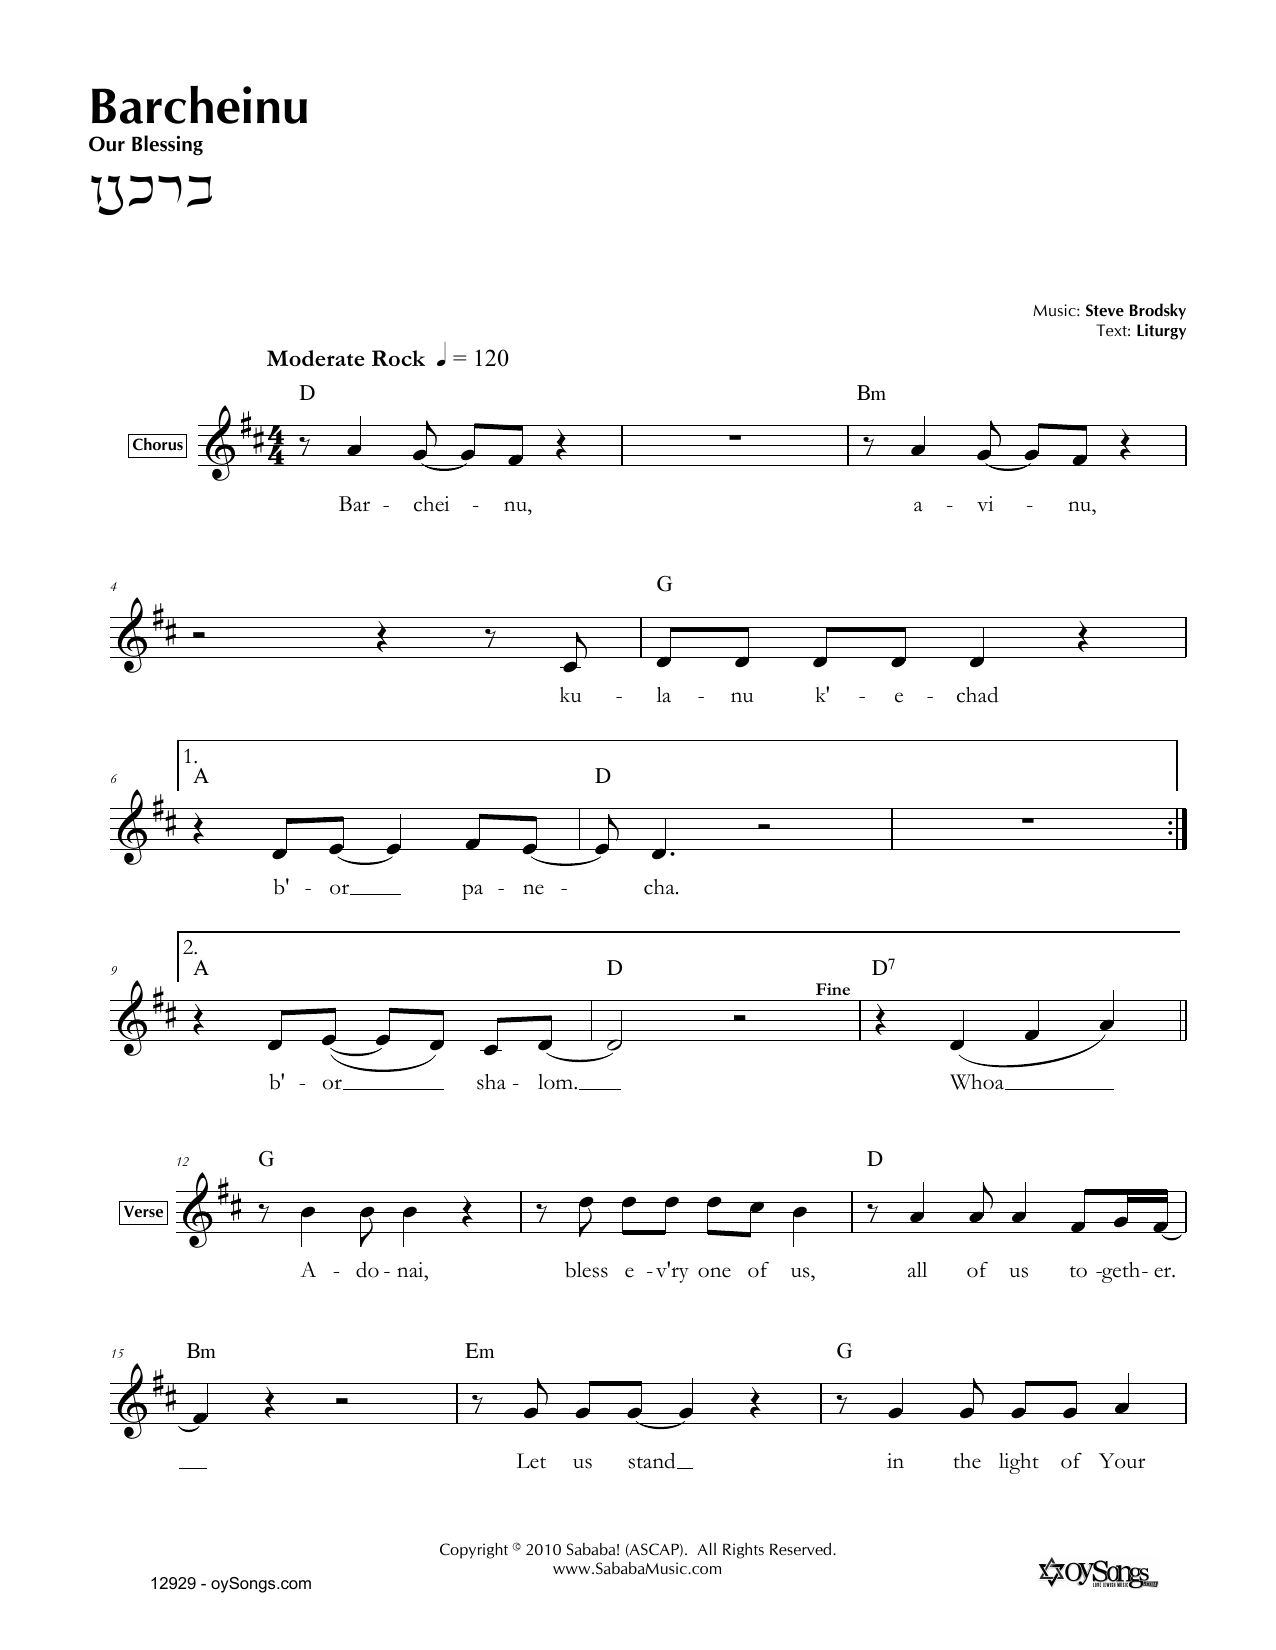 Barcheinu Sheet Music